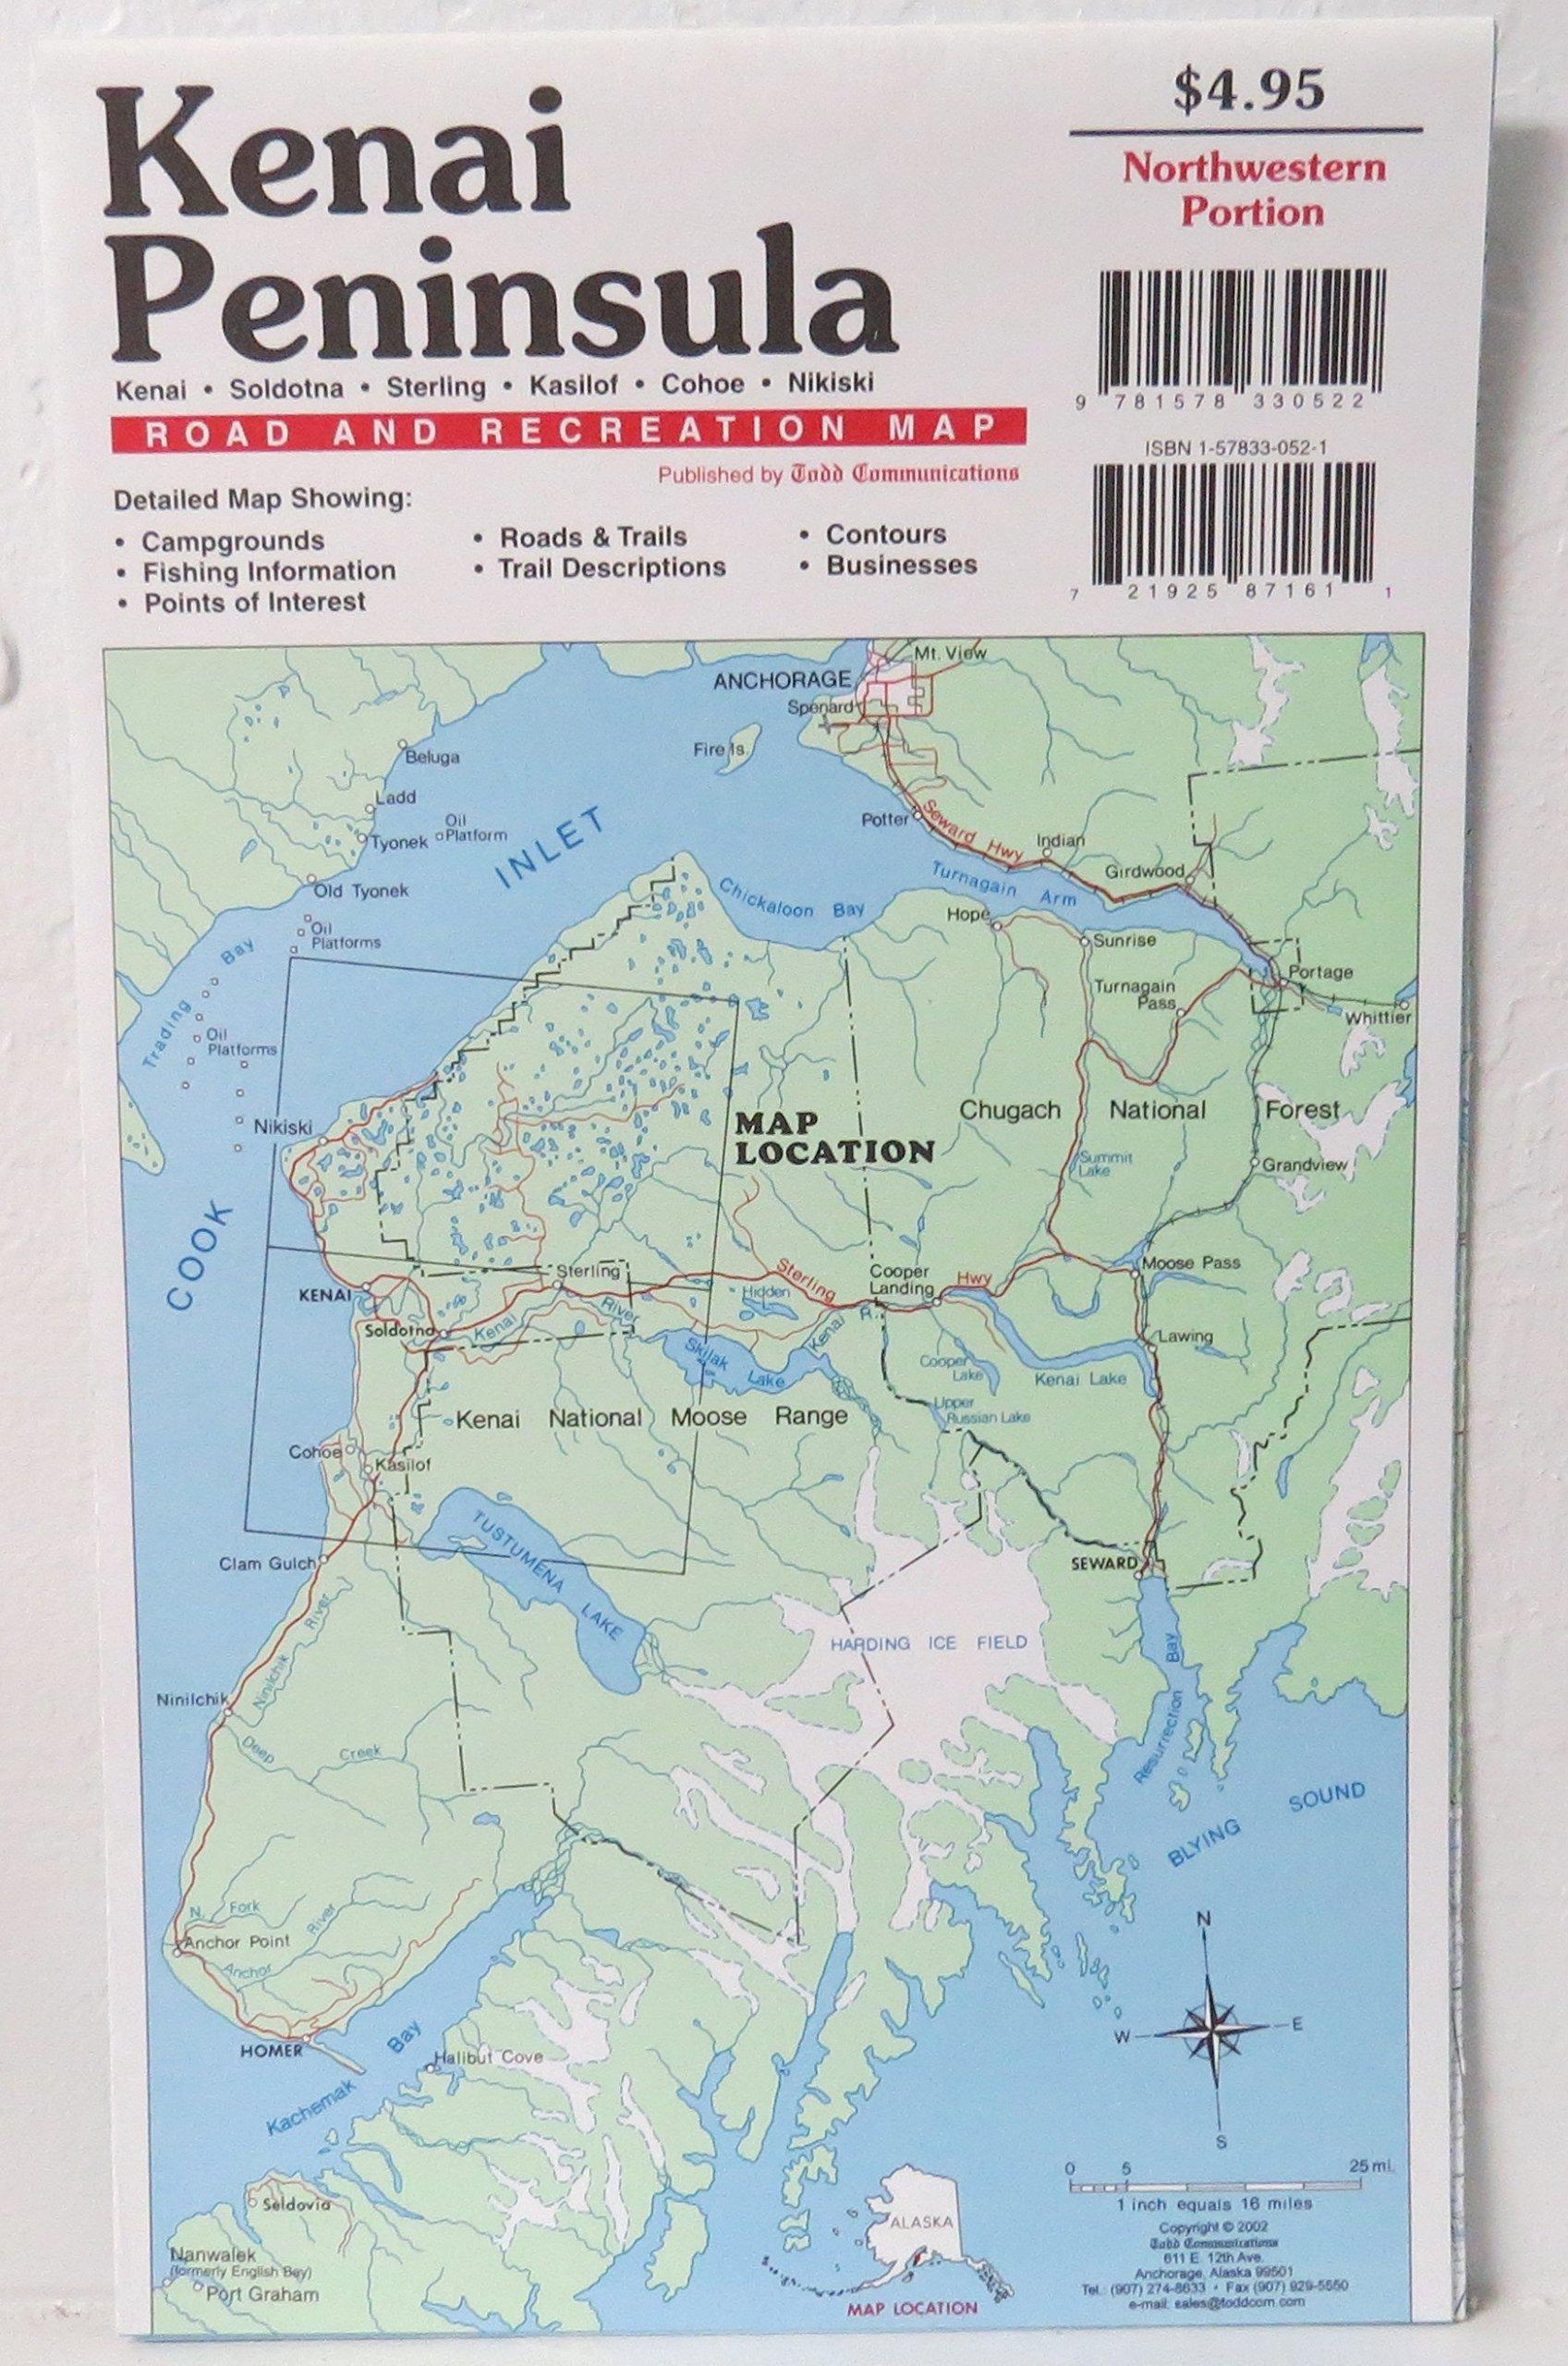 Kenai Peninsula Road and Recreation Map : Kenai, Soldotna, Sternling on manley hot springs map, cordova map, eielson afb map, new stuyahok map, holy cross map, marshall map, yakutat map, adak map, king salmon map, talkeetna map, mountain village map, nome map, anchorage map, homer map, big lake map, whittier map, wainwright map, tustumena lake map, sitka map, st. paul island map,